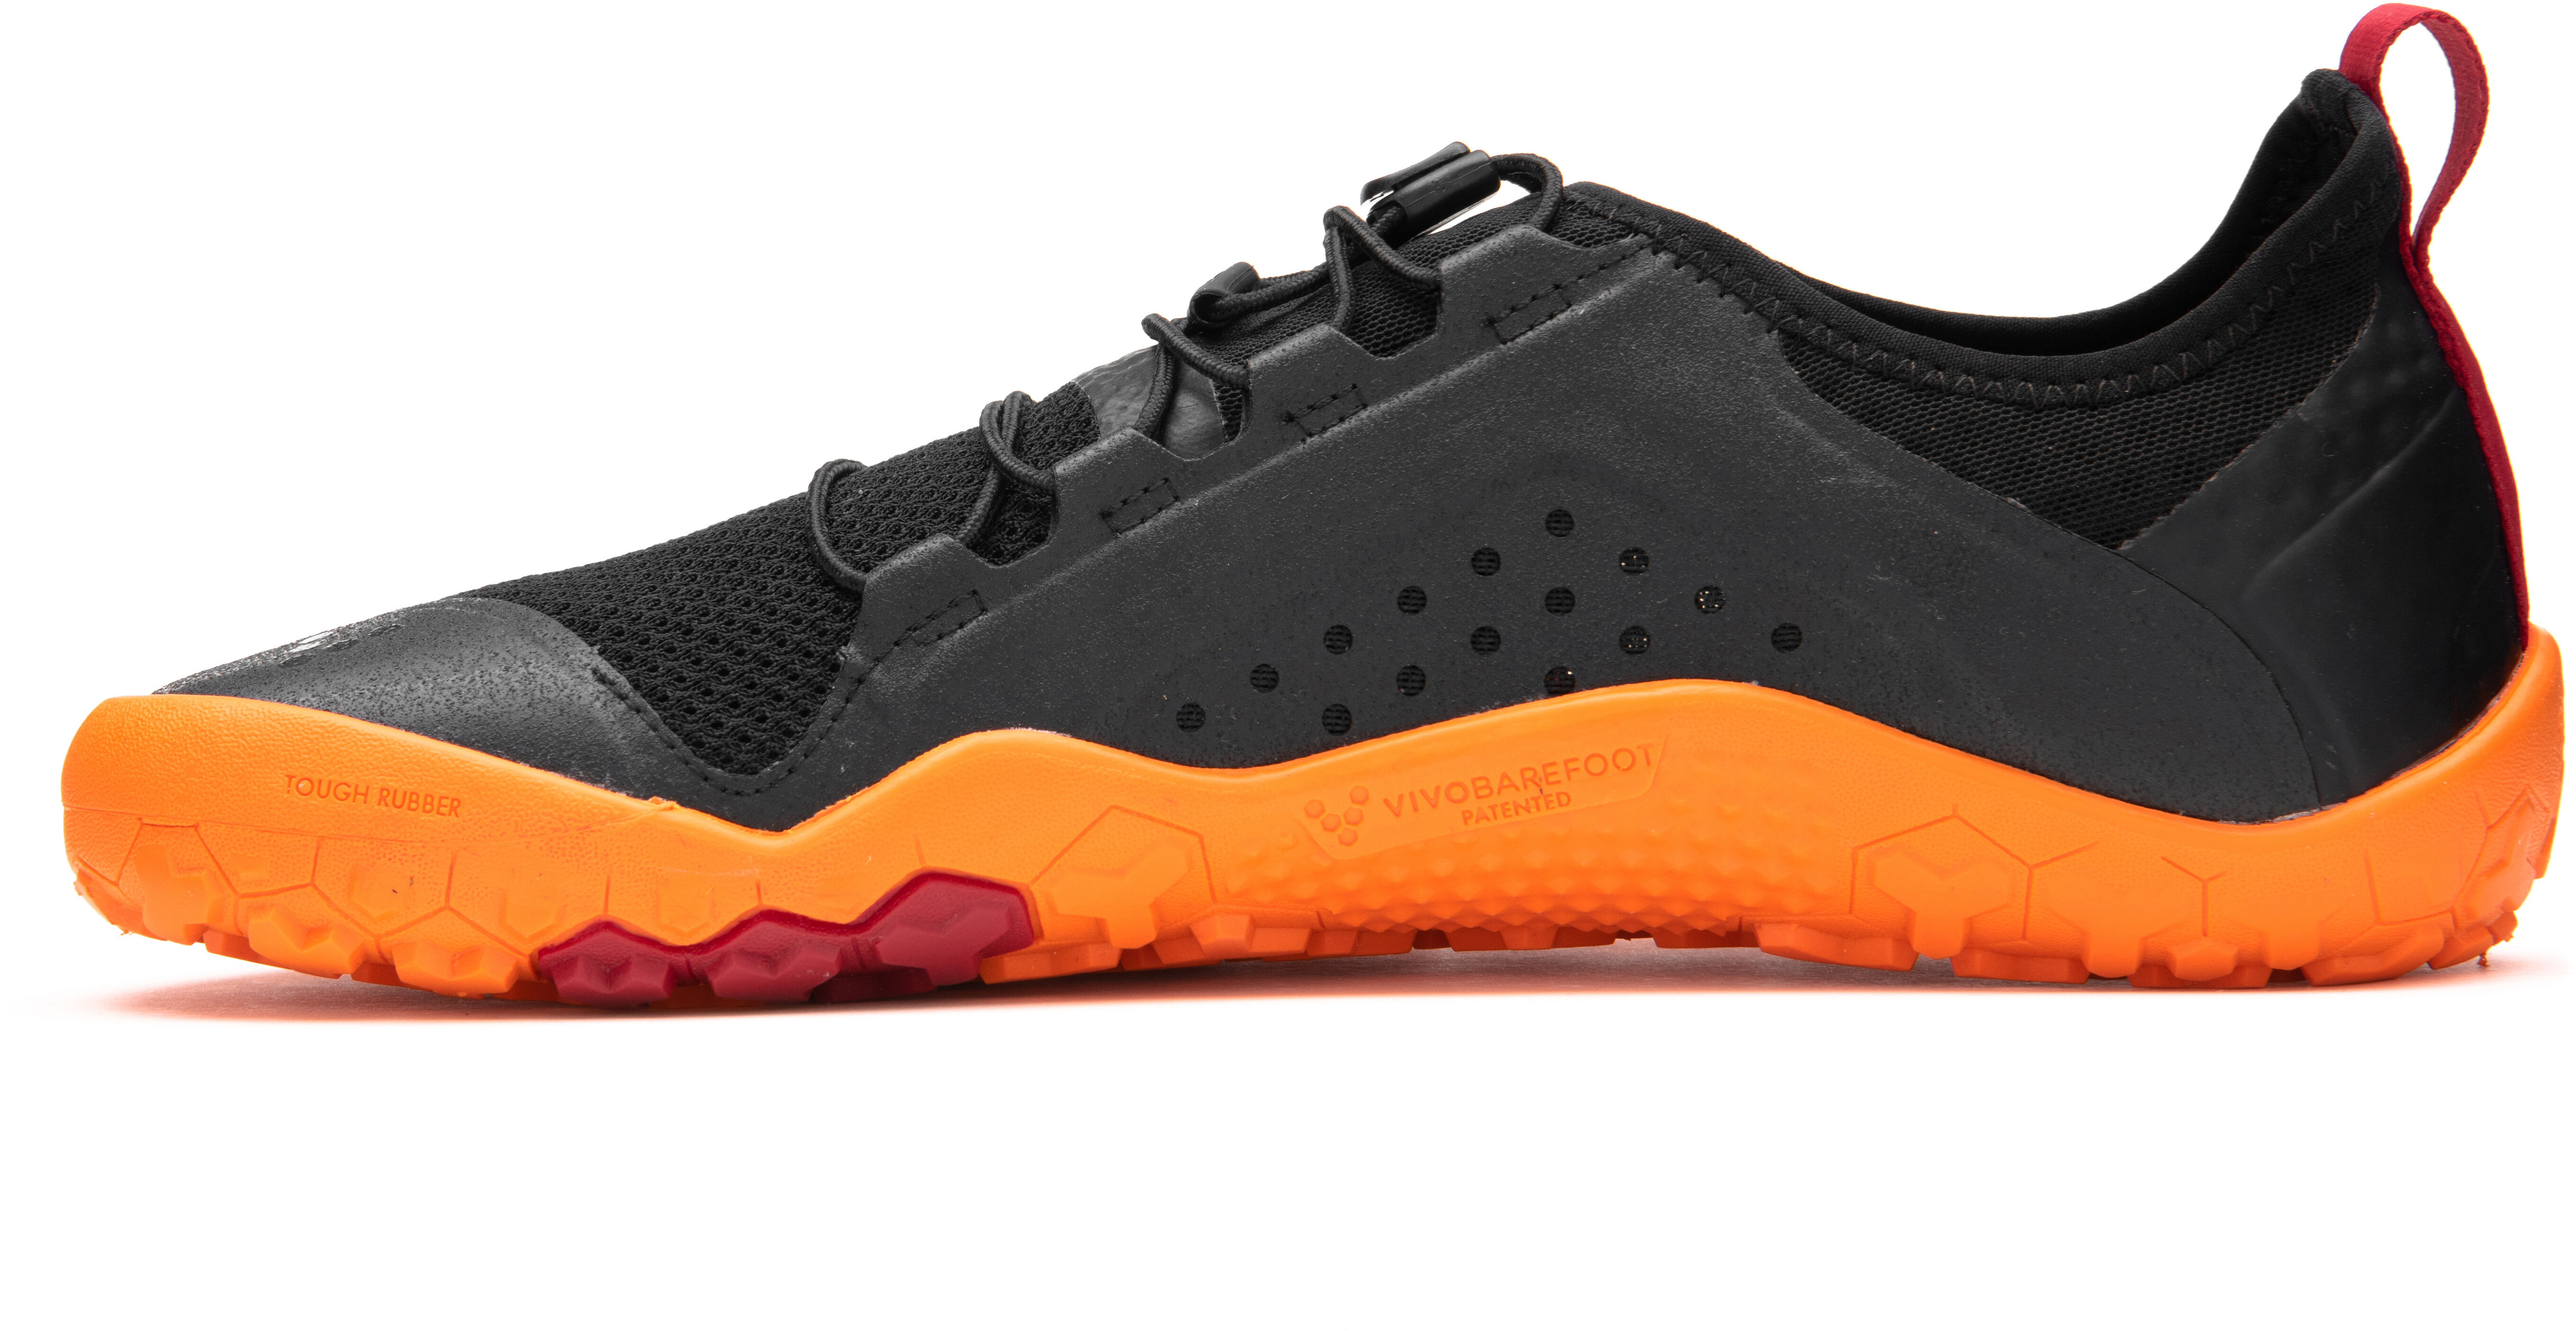 46cd66982bb076 Vivobarefoot Primus Swimrun FG Mesh - Chaussures running Femme - orange/noir